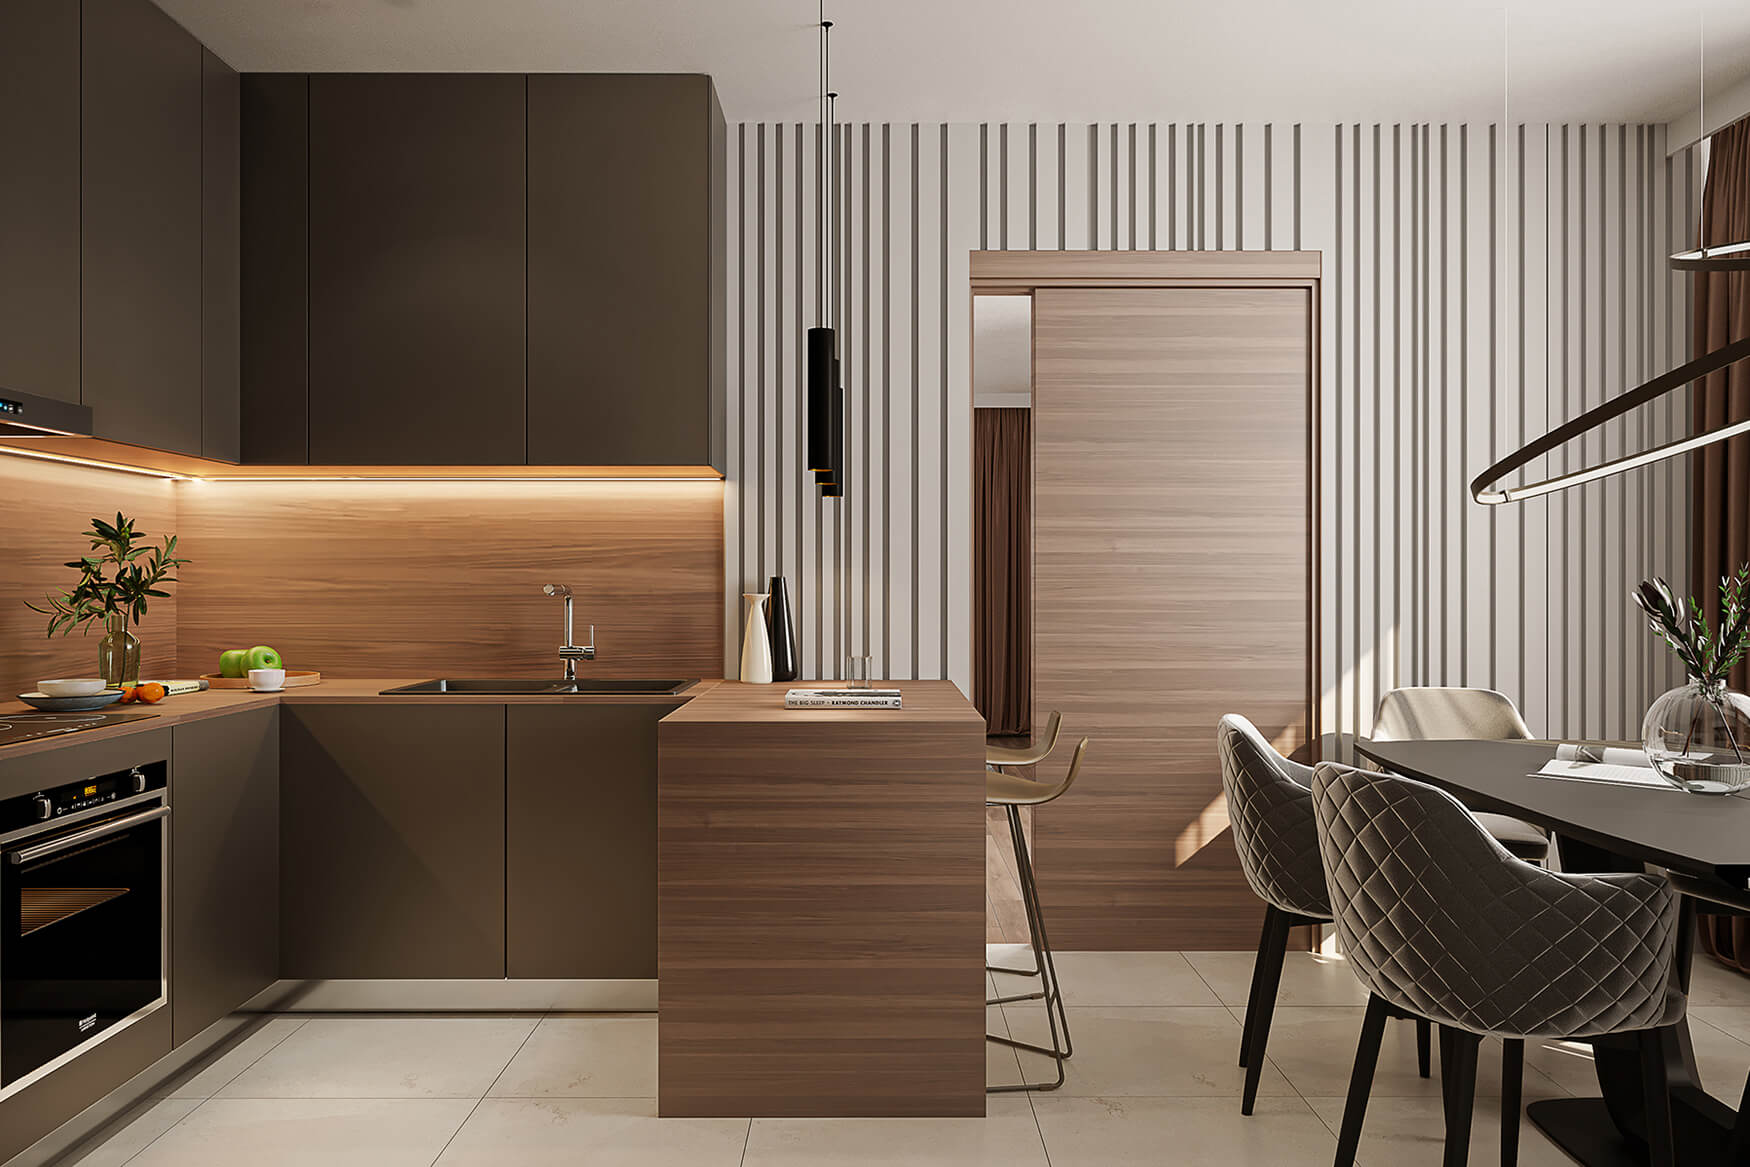 interioren-dizain-proekt-na-kuhnia-po-individualen-proekt